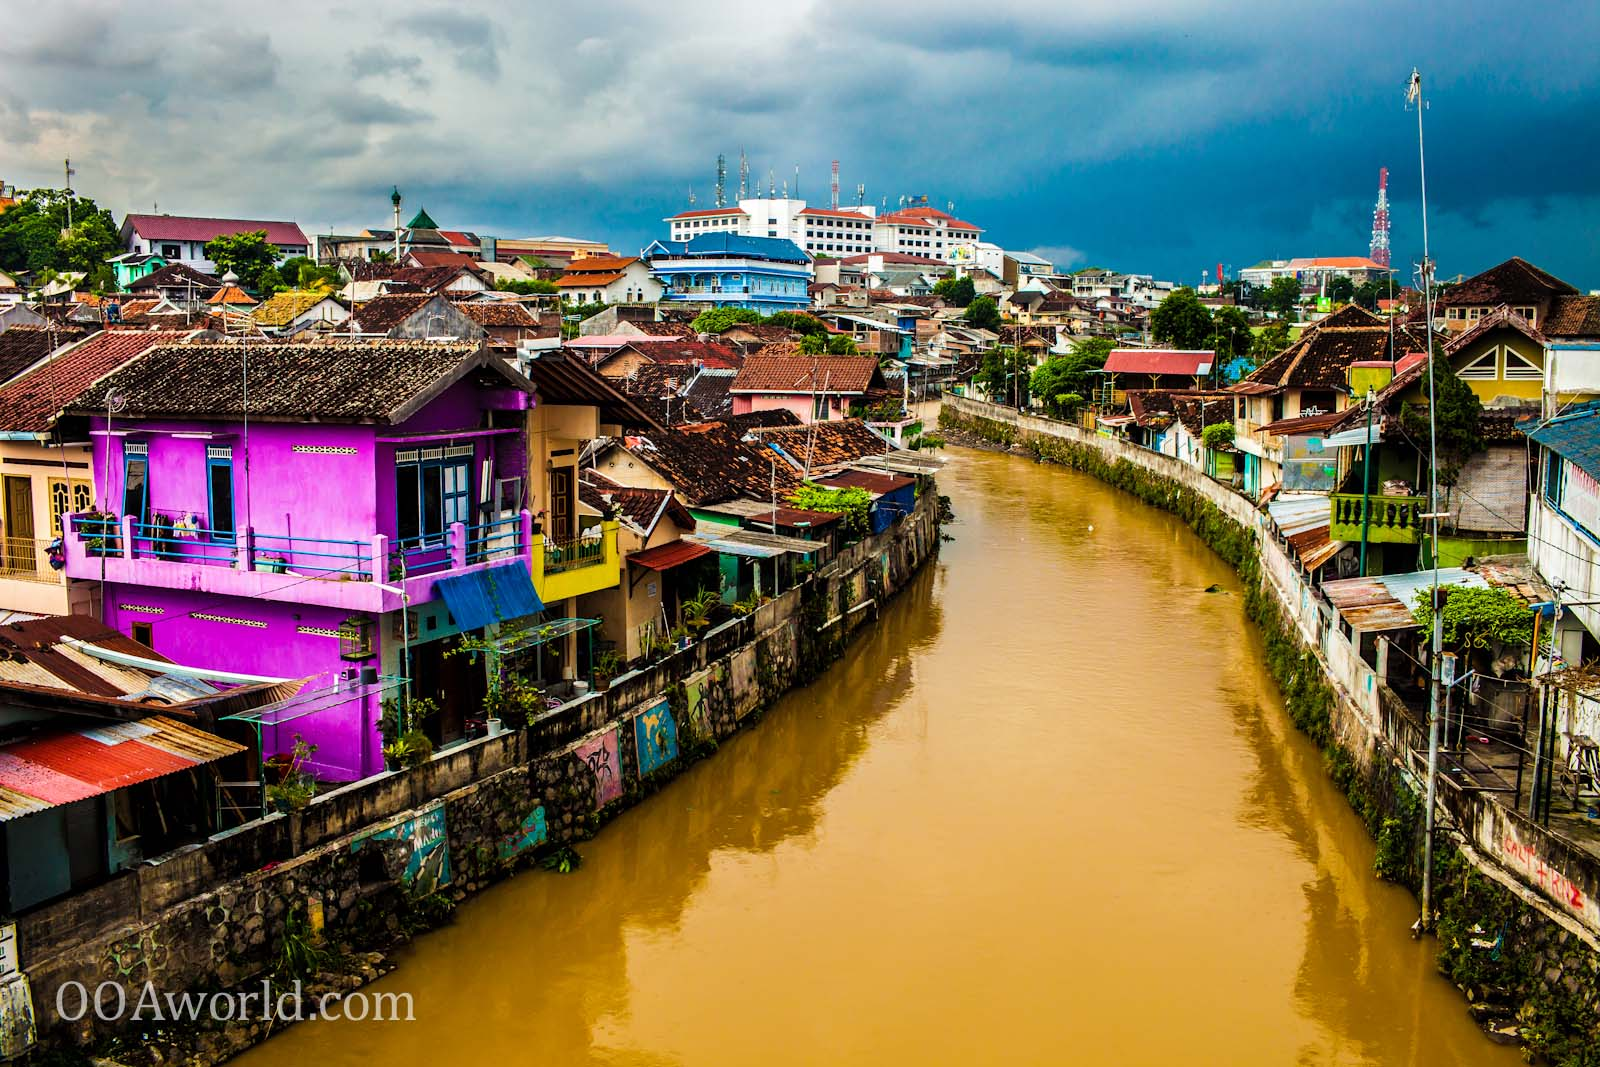 Photo Jogja Indonesia River View Ooaworld